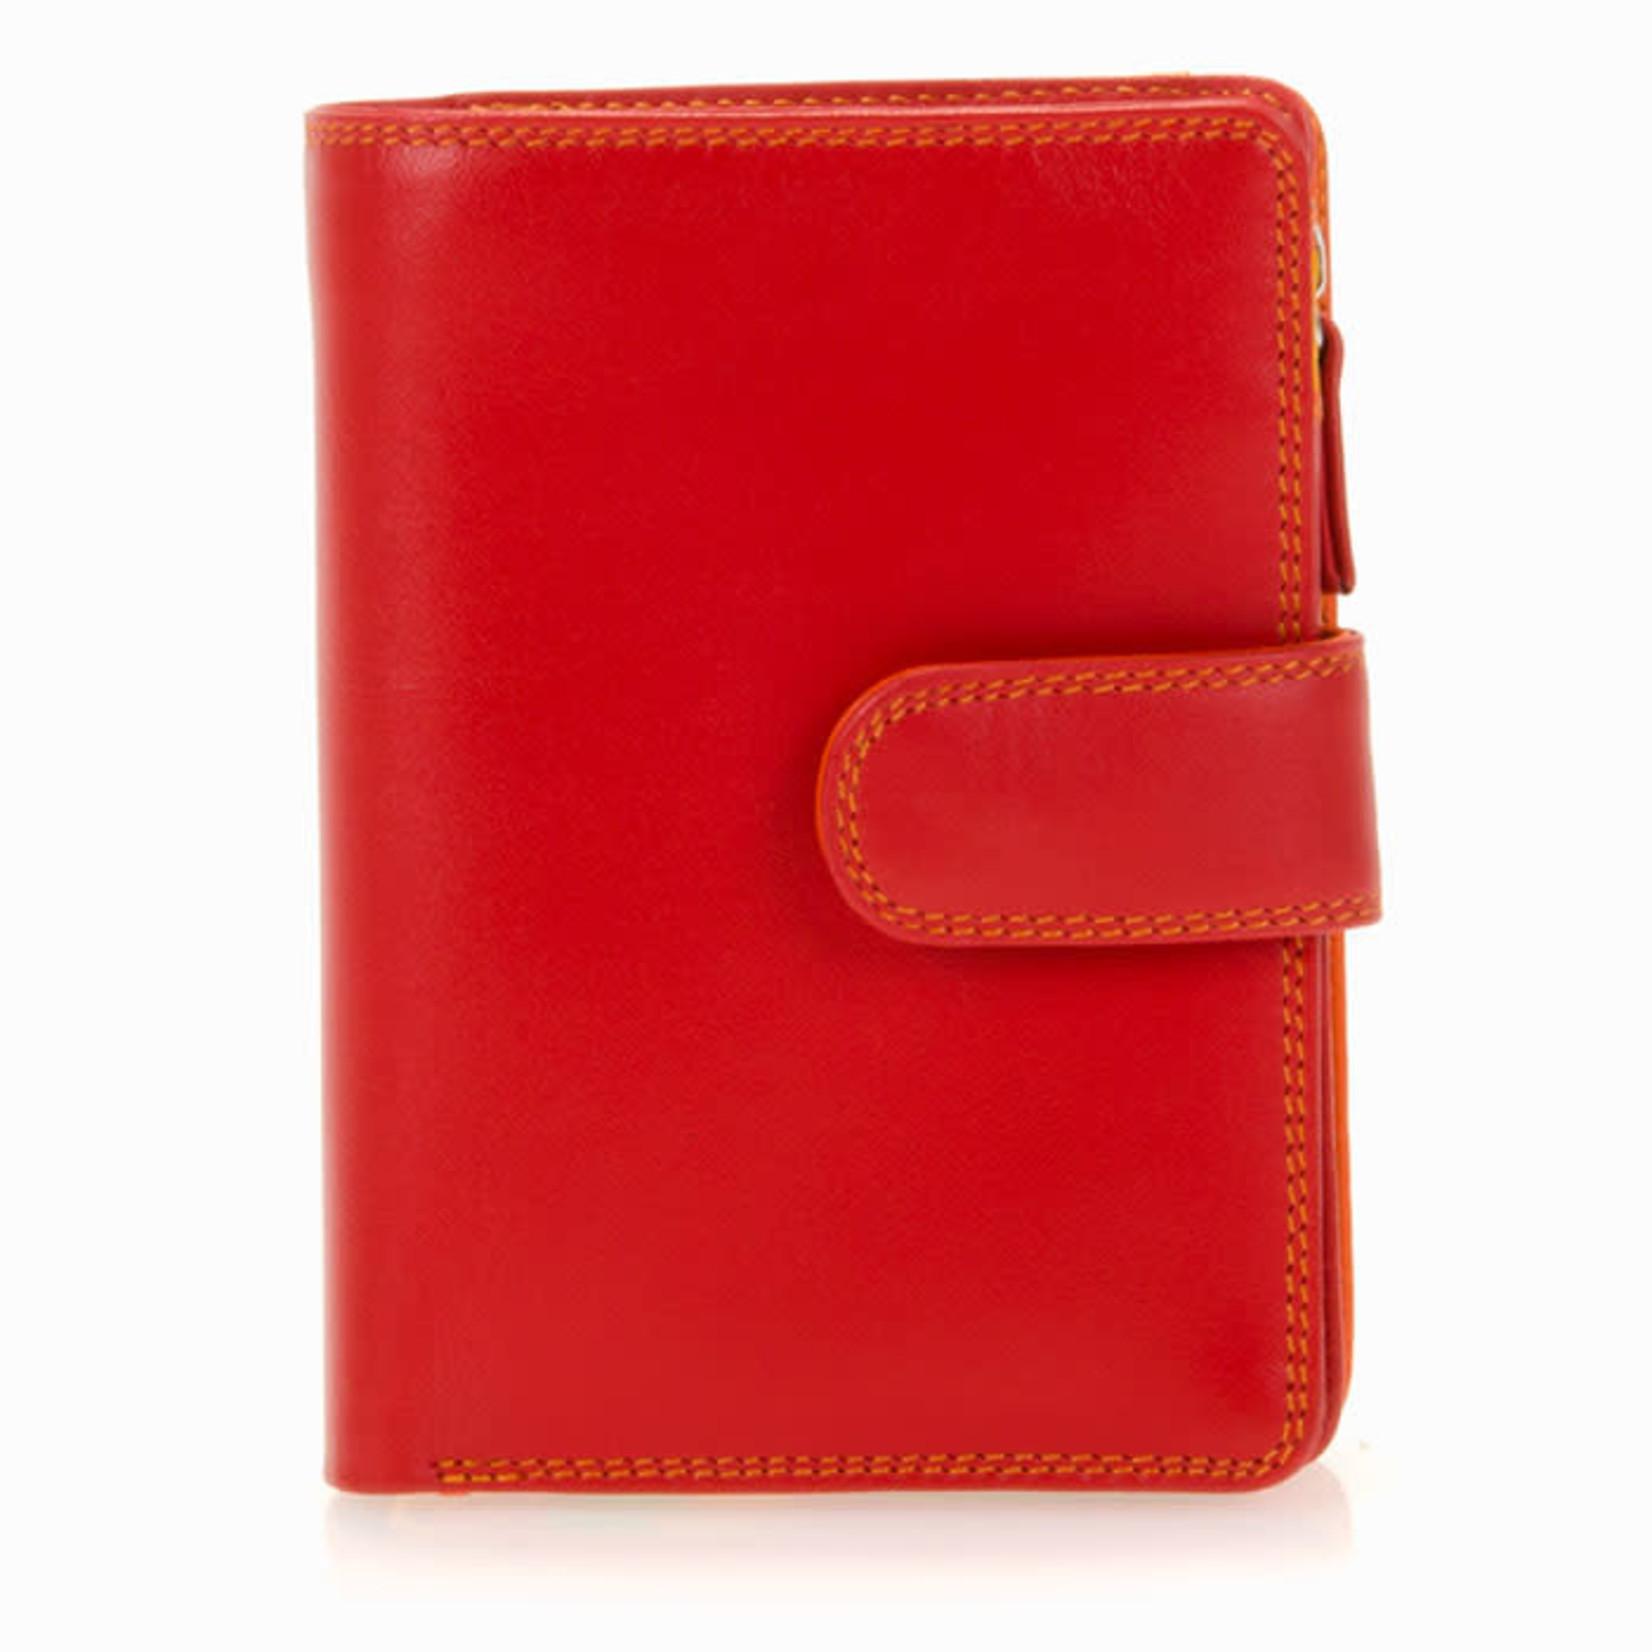 MyWalit Medium 10 C/C Wallet w/Zip Purse Jamaica